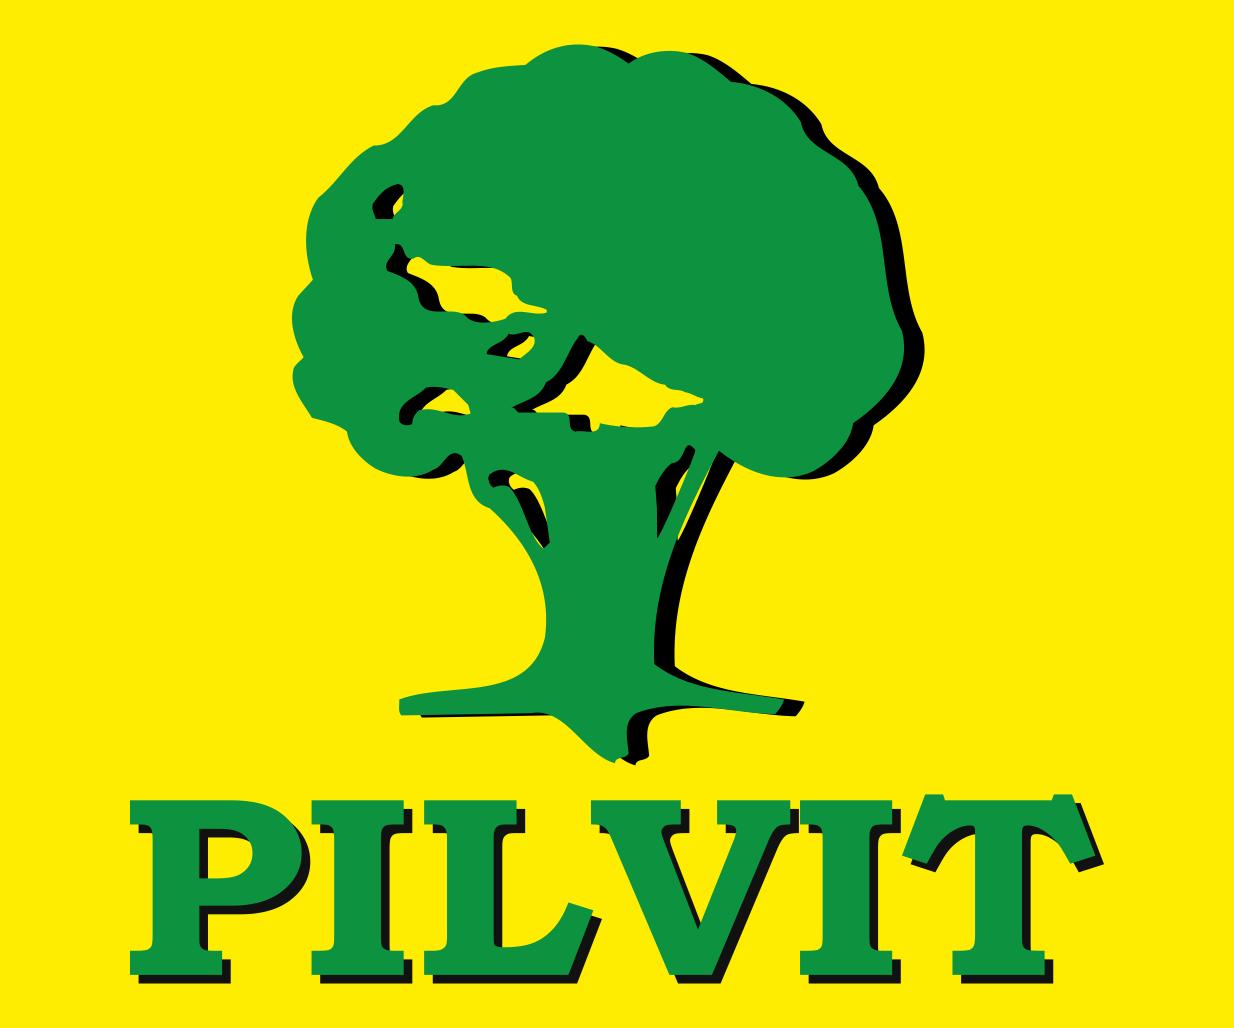 point_pilvit_logo_1